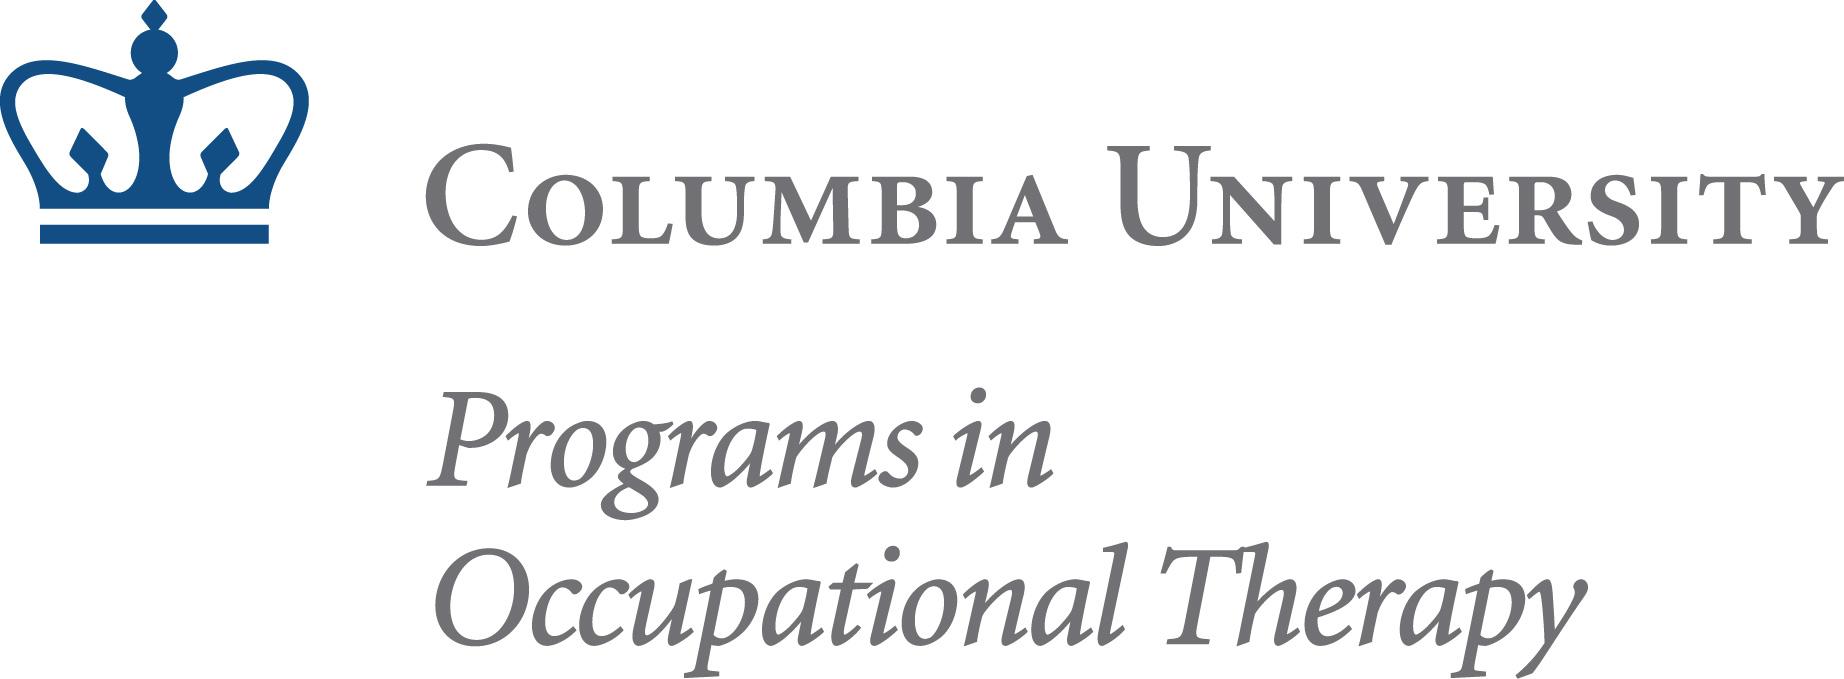 Columbia University OT logo.jpg